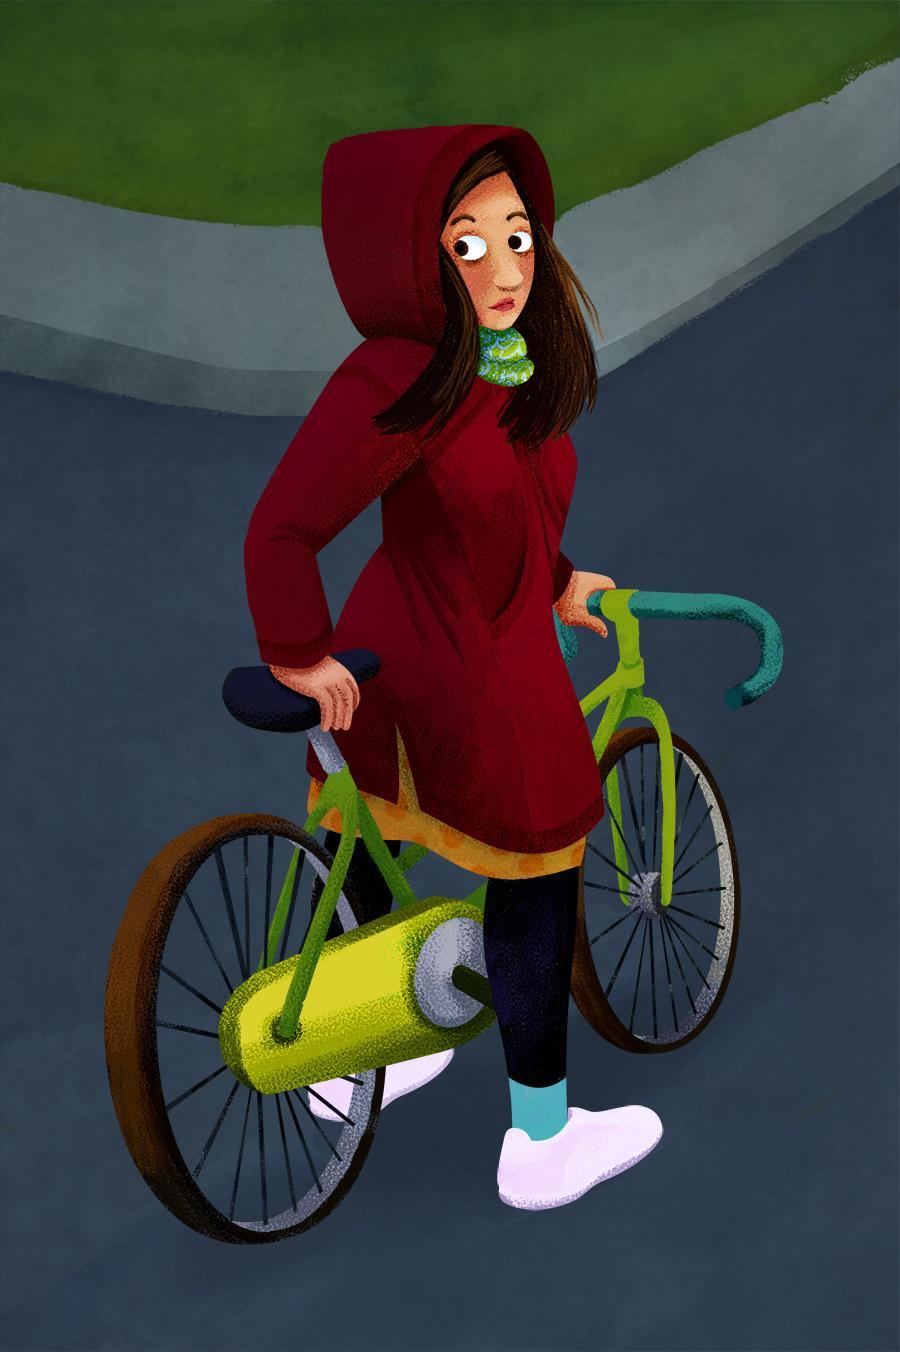 Bike Girl - image 6 - student project